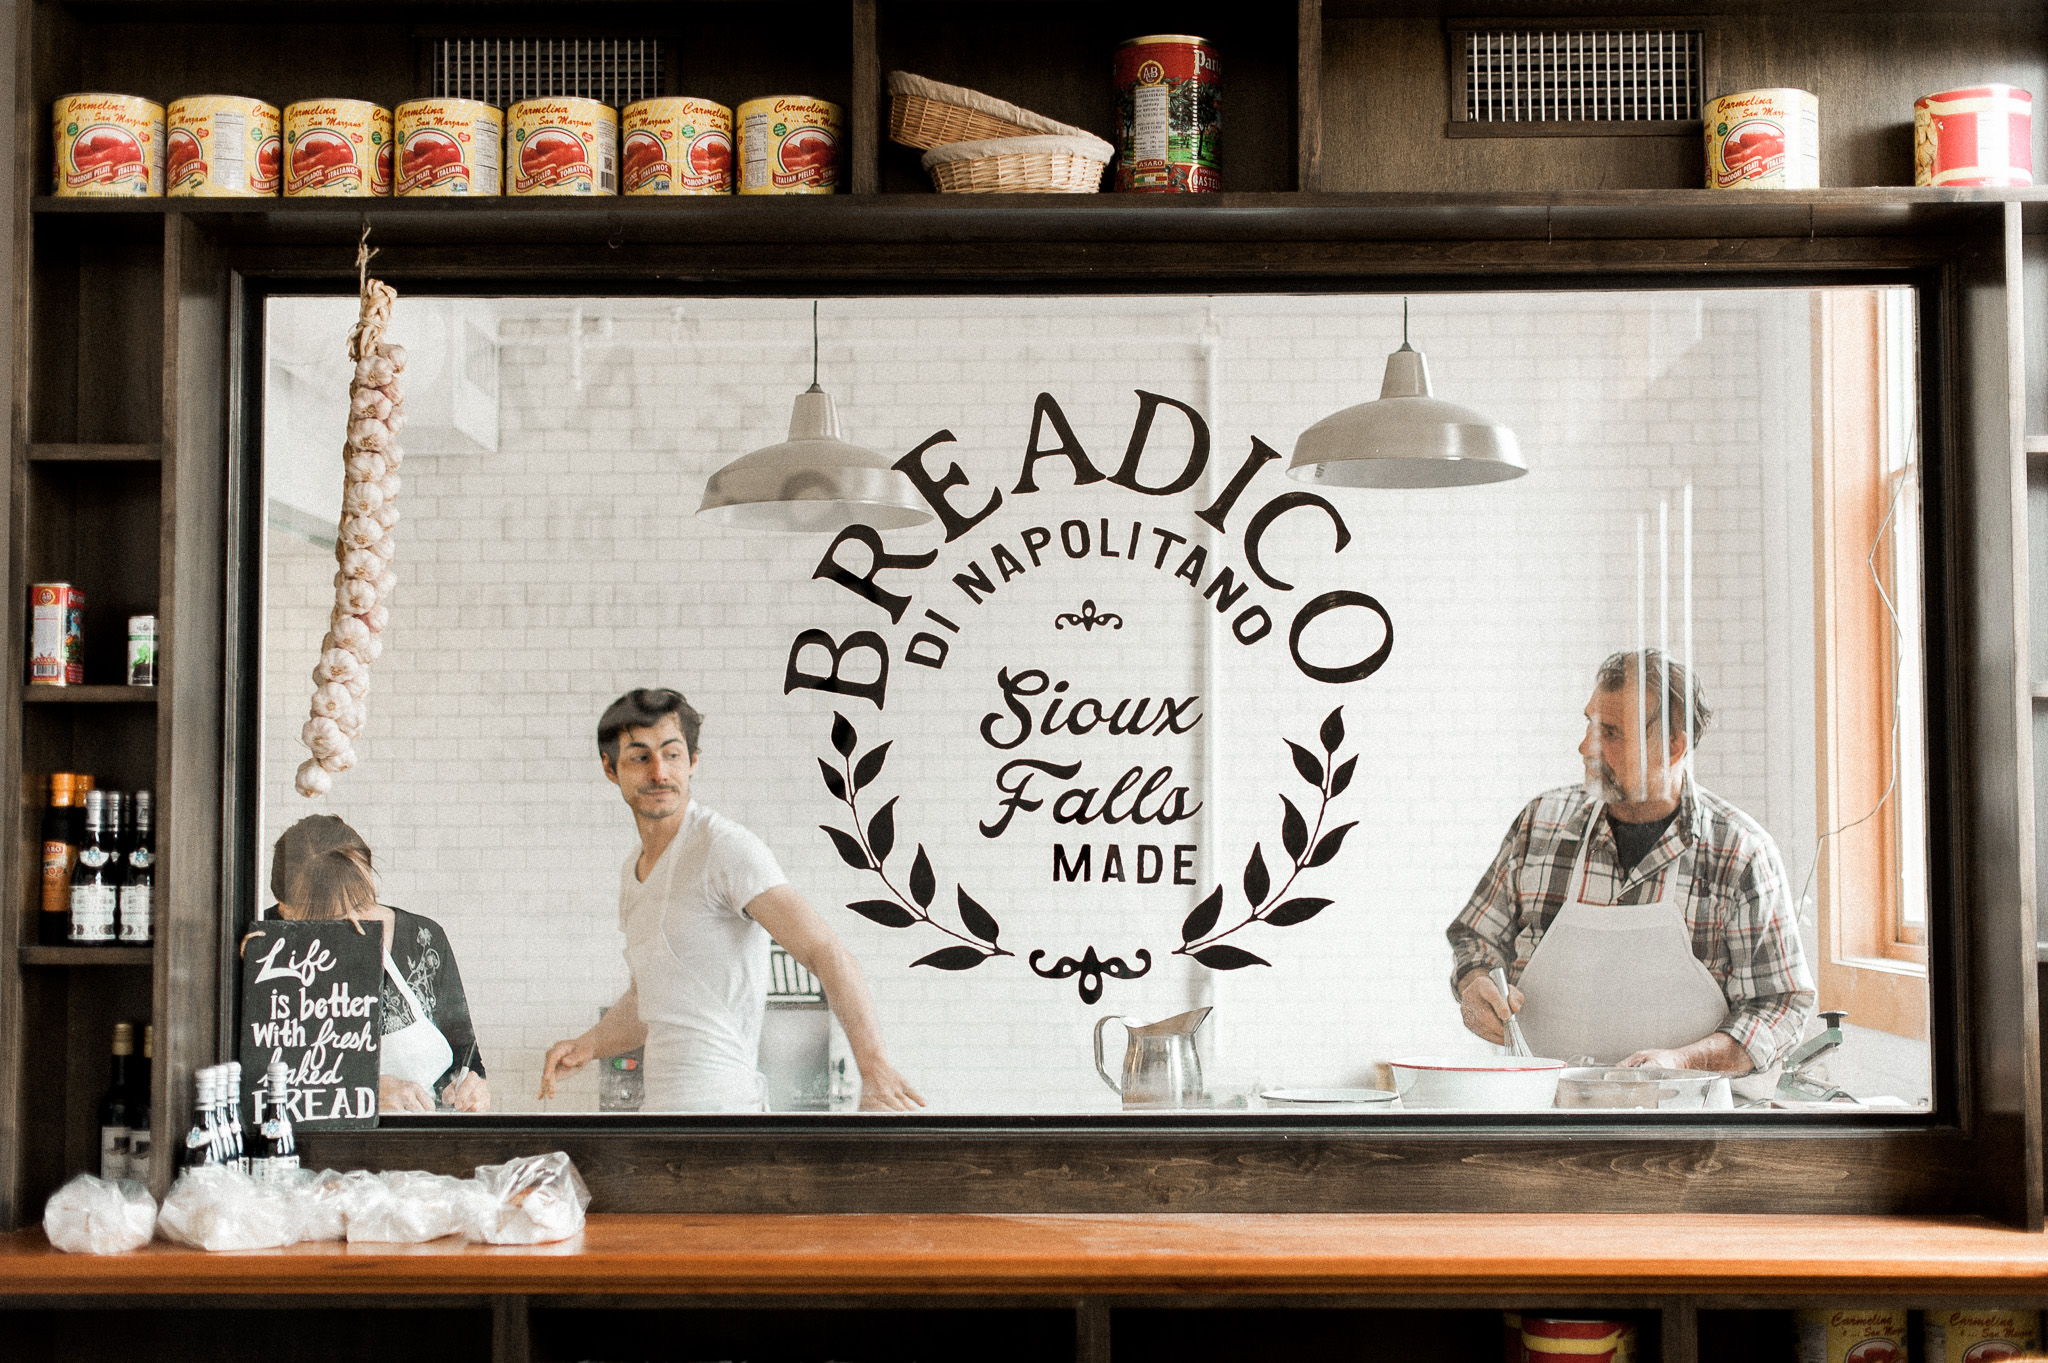 Breadico - May-5.jpg